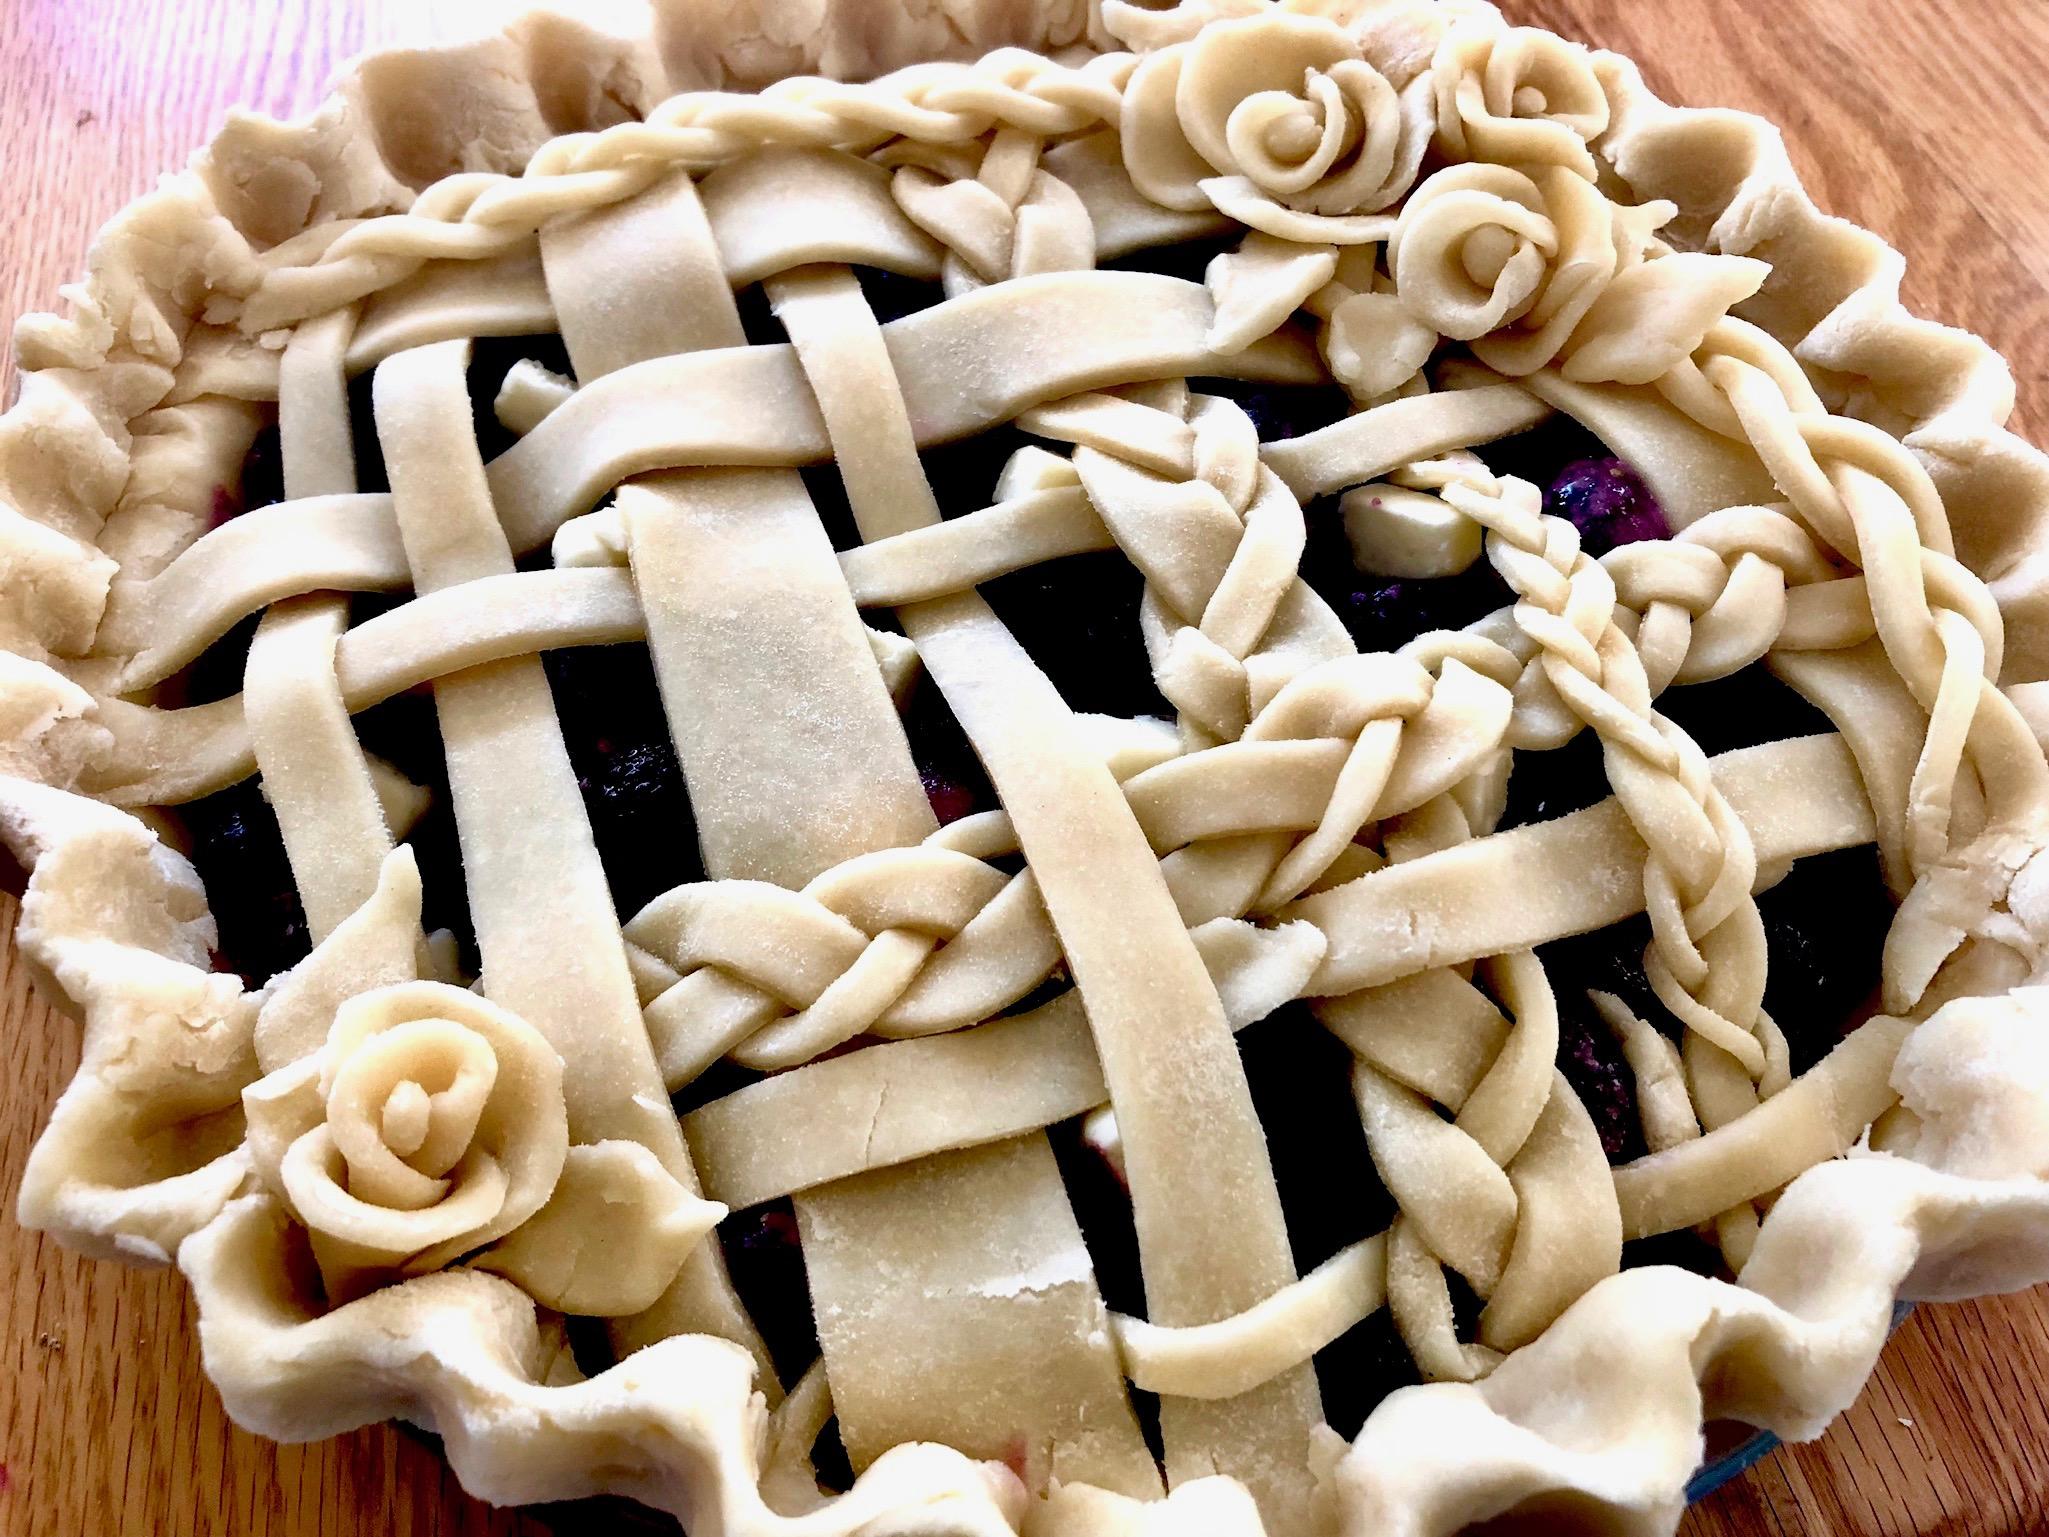 whimsical braided lattice for pie: beneath the crust